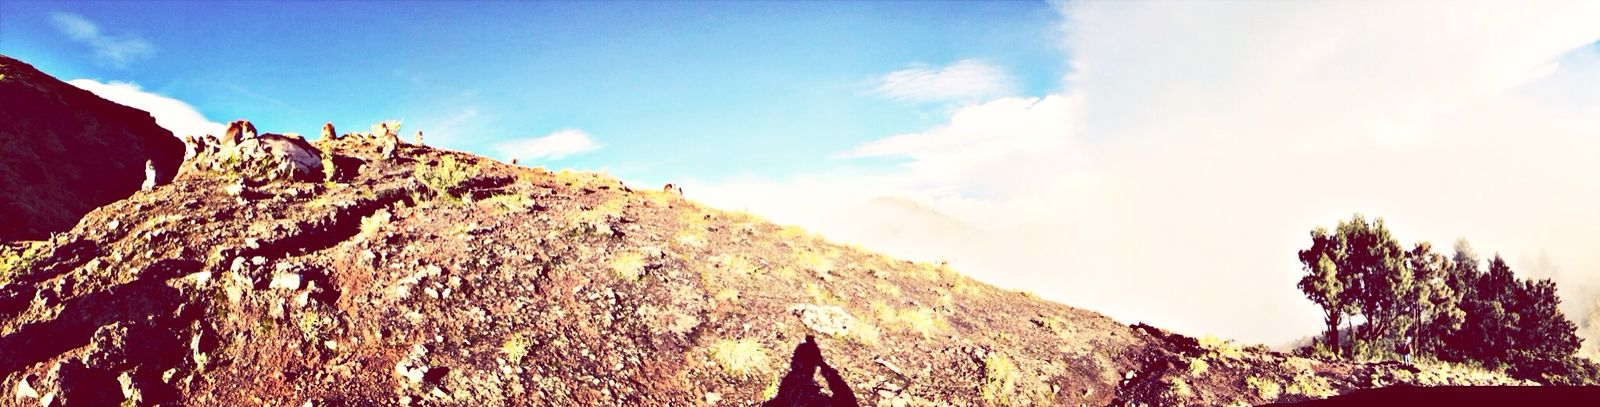 Trekking Monkeys